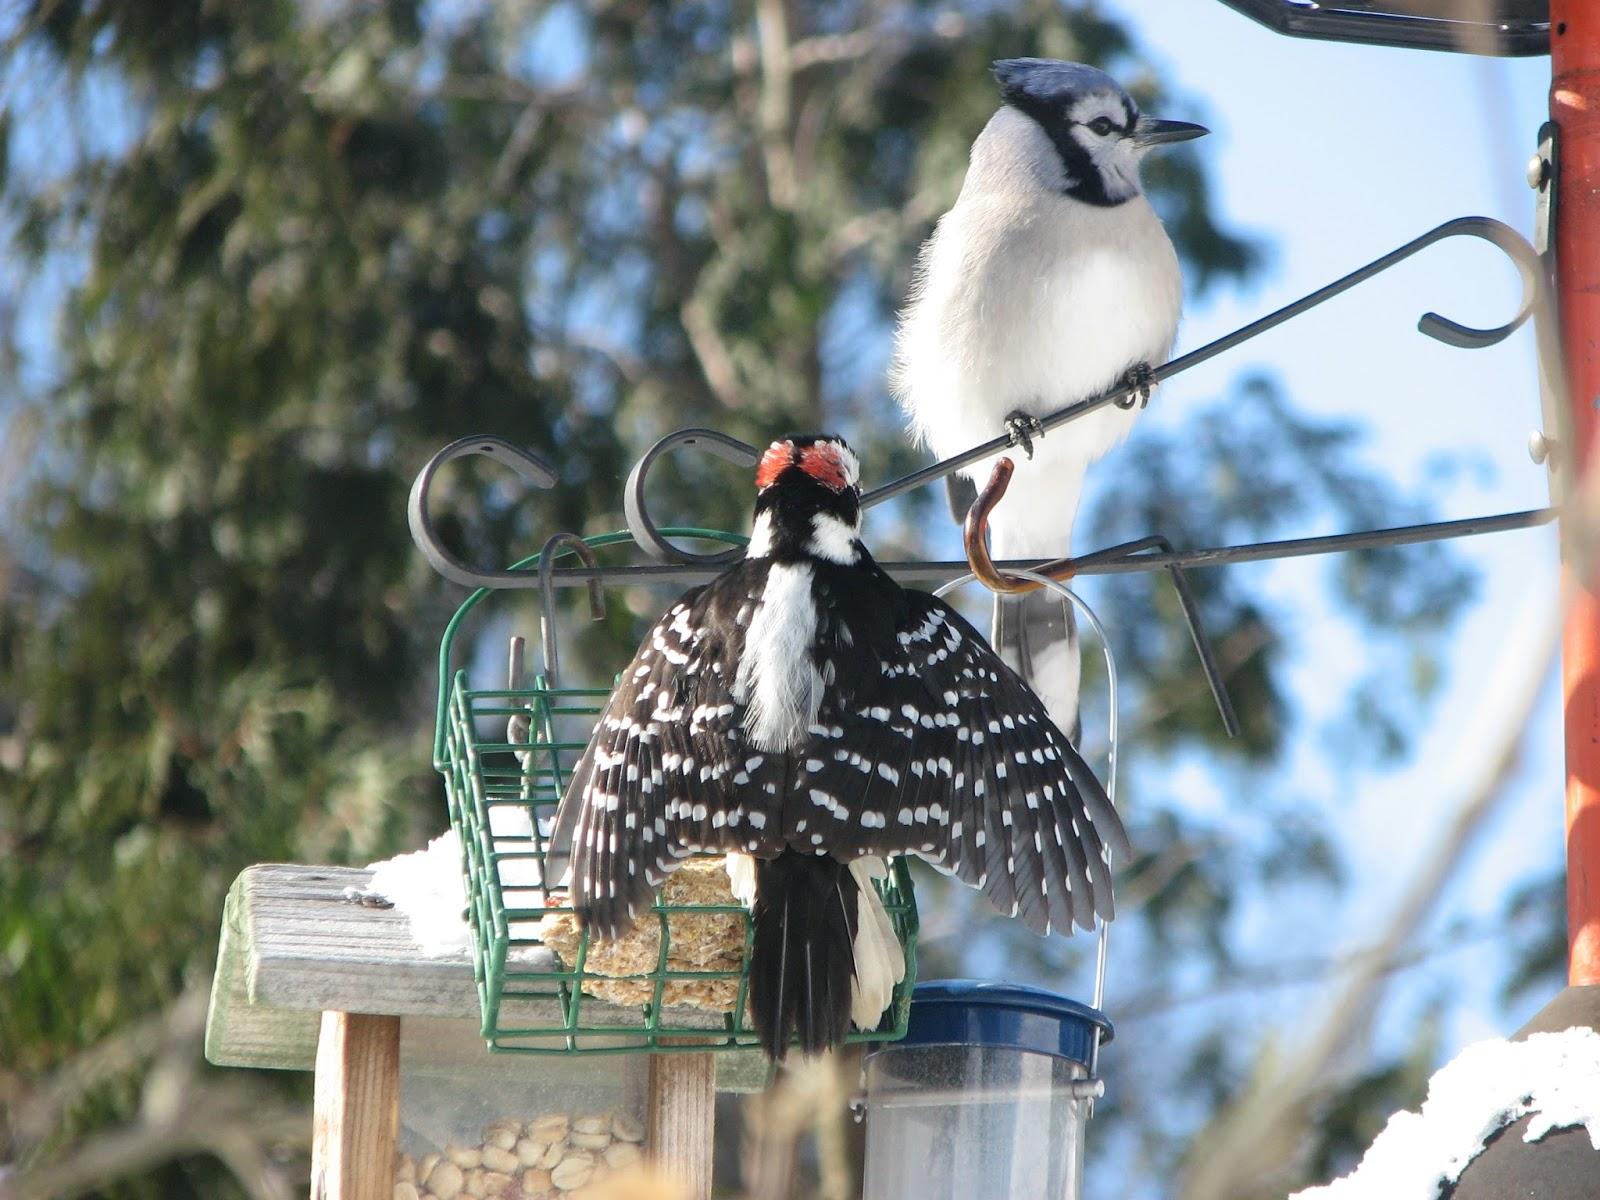 south burlington birds beautiful nature litter free south